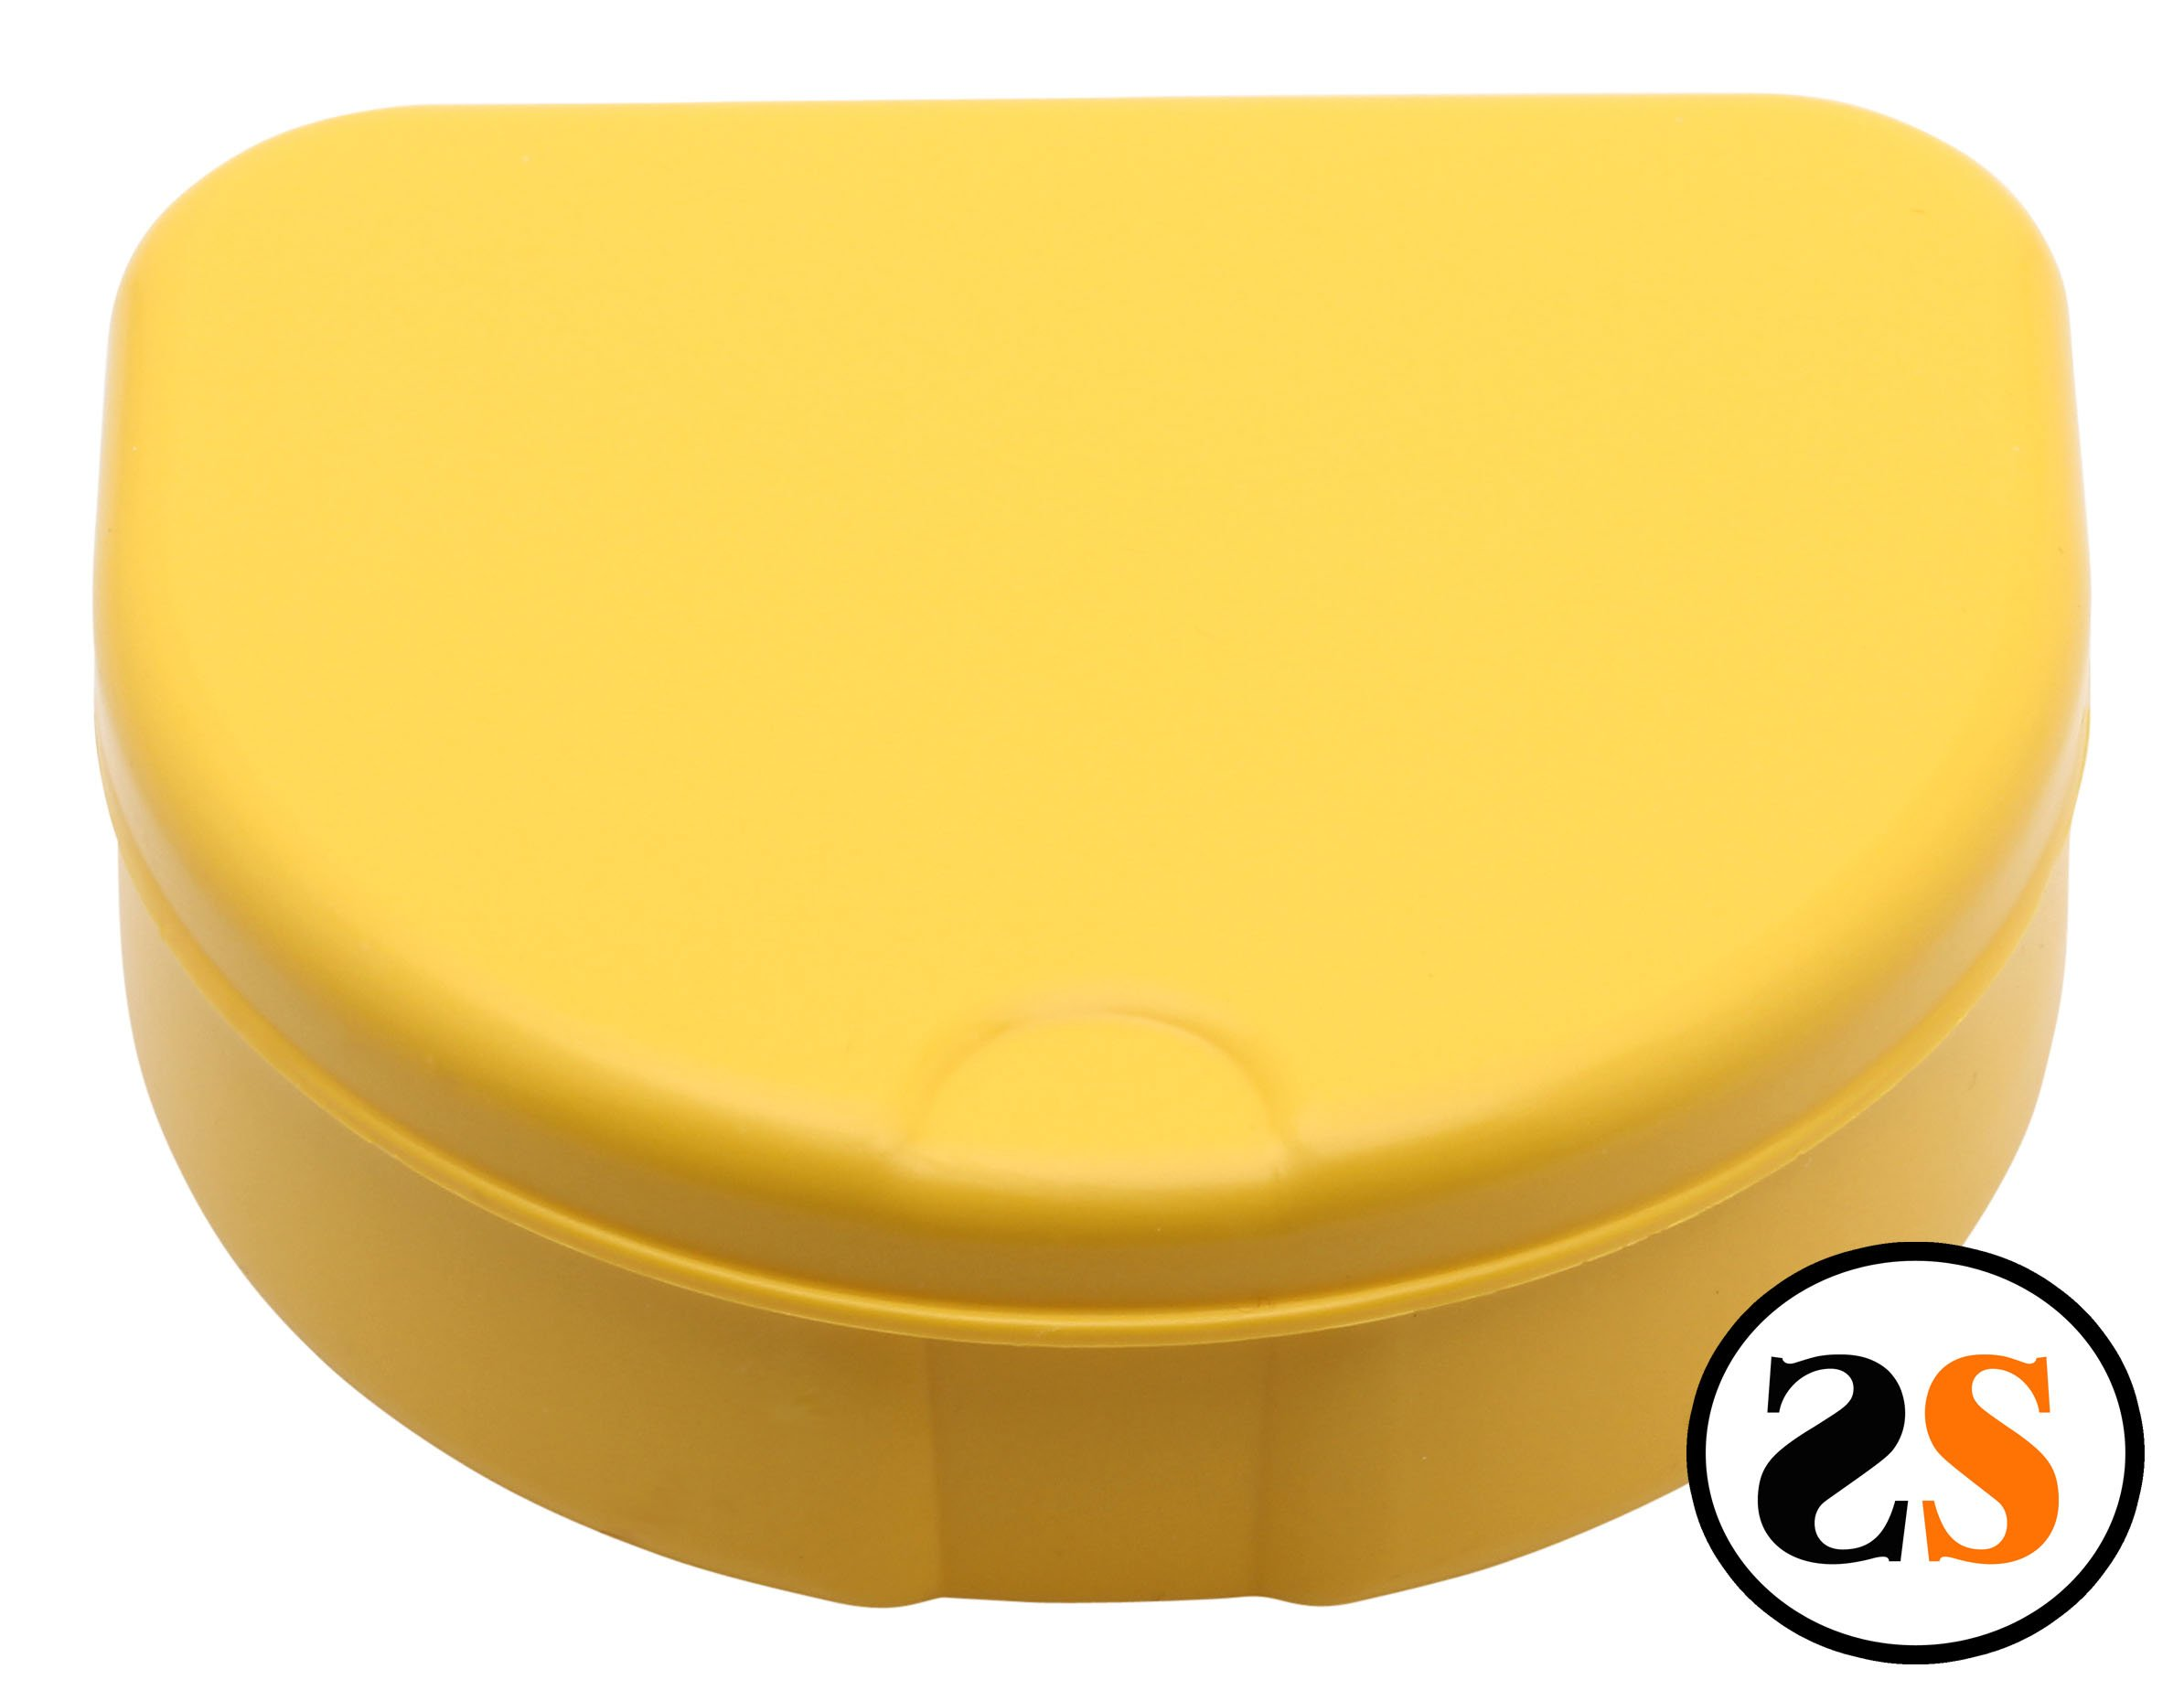 8 Pack Dental Retainer Invisalign Denture Mouthguard Case Storage